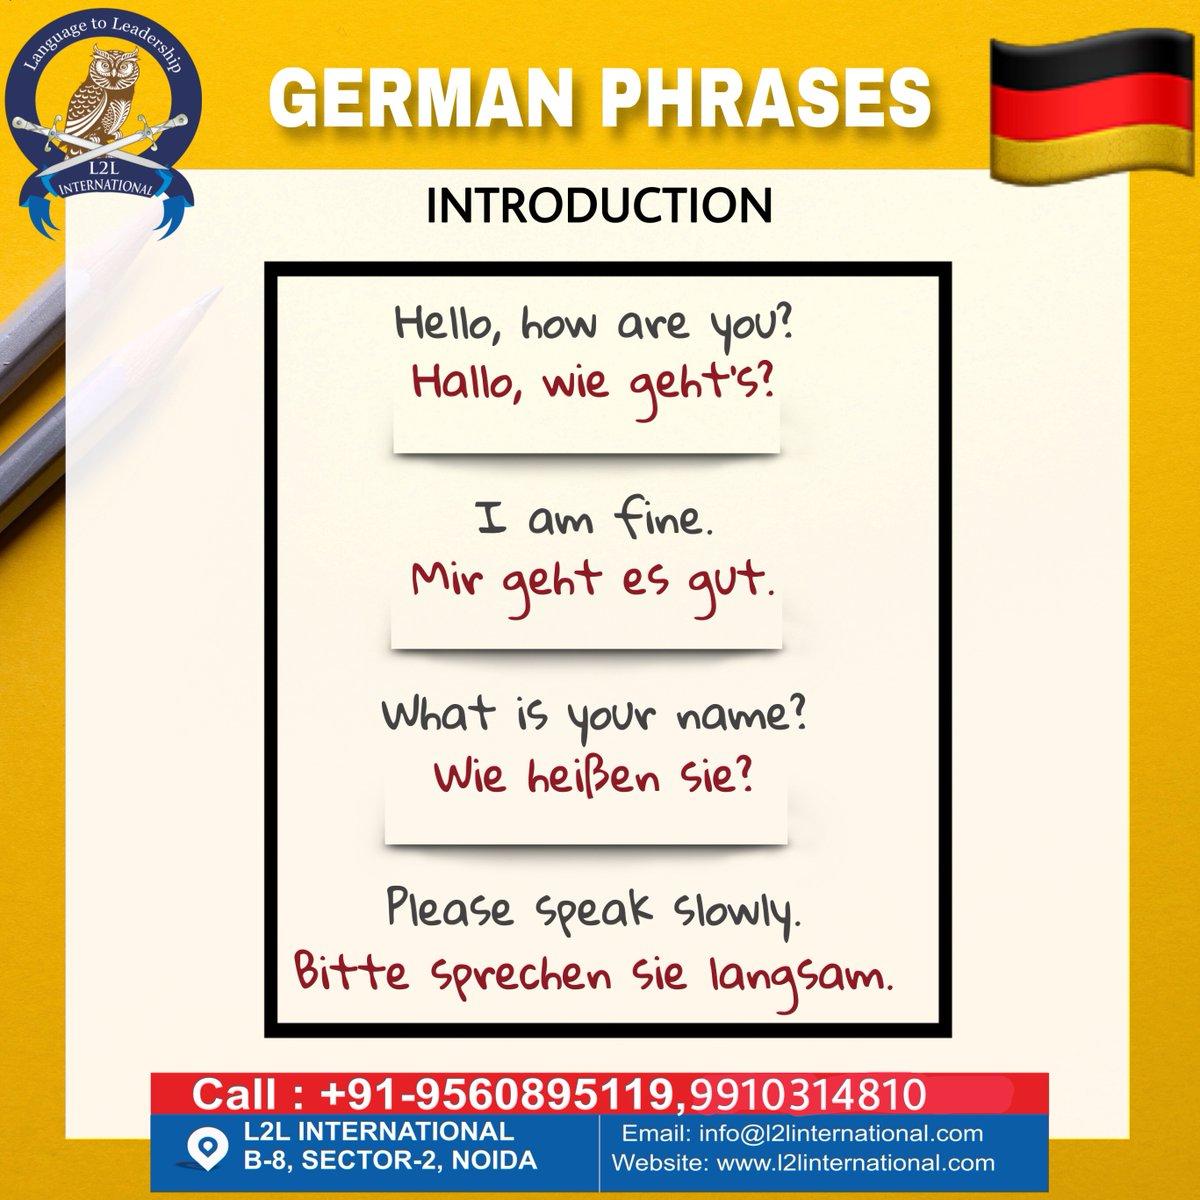 Fun Facts About Germany! #fun #berlin #europe #german #germany #germanoftheday #germanword #wortschatz #deutschlernen  #germanwords #germancourse #germanclass #deutschkurs #learn #germanschool #Foreign #Language #L2L #Motivation #instalikes  #study #studyingermany #aboutgermanypic.twitter.com/9bnz3r15Cv